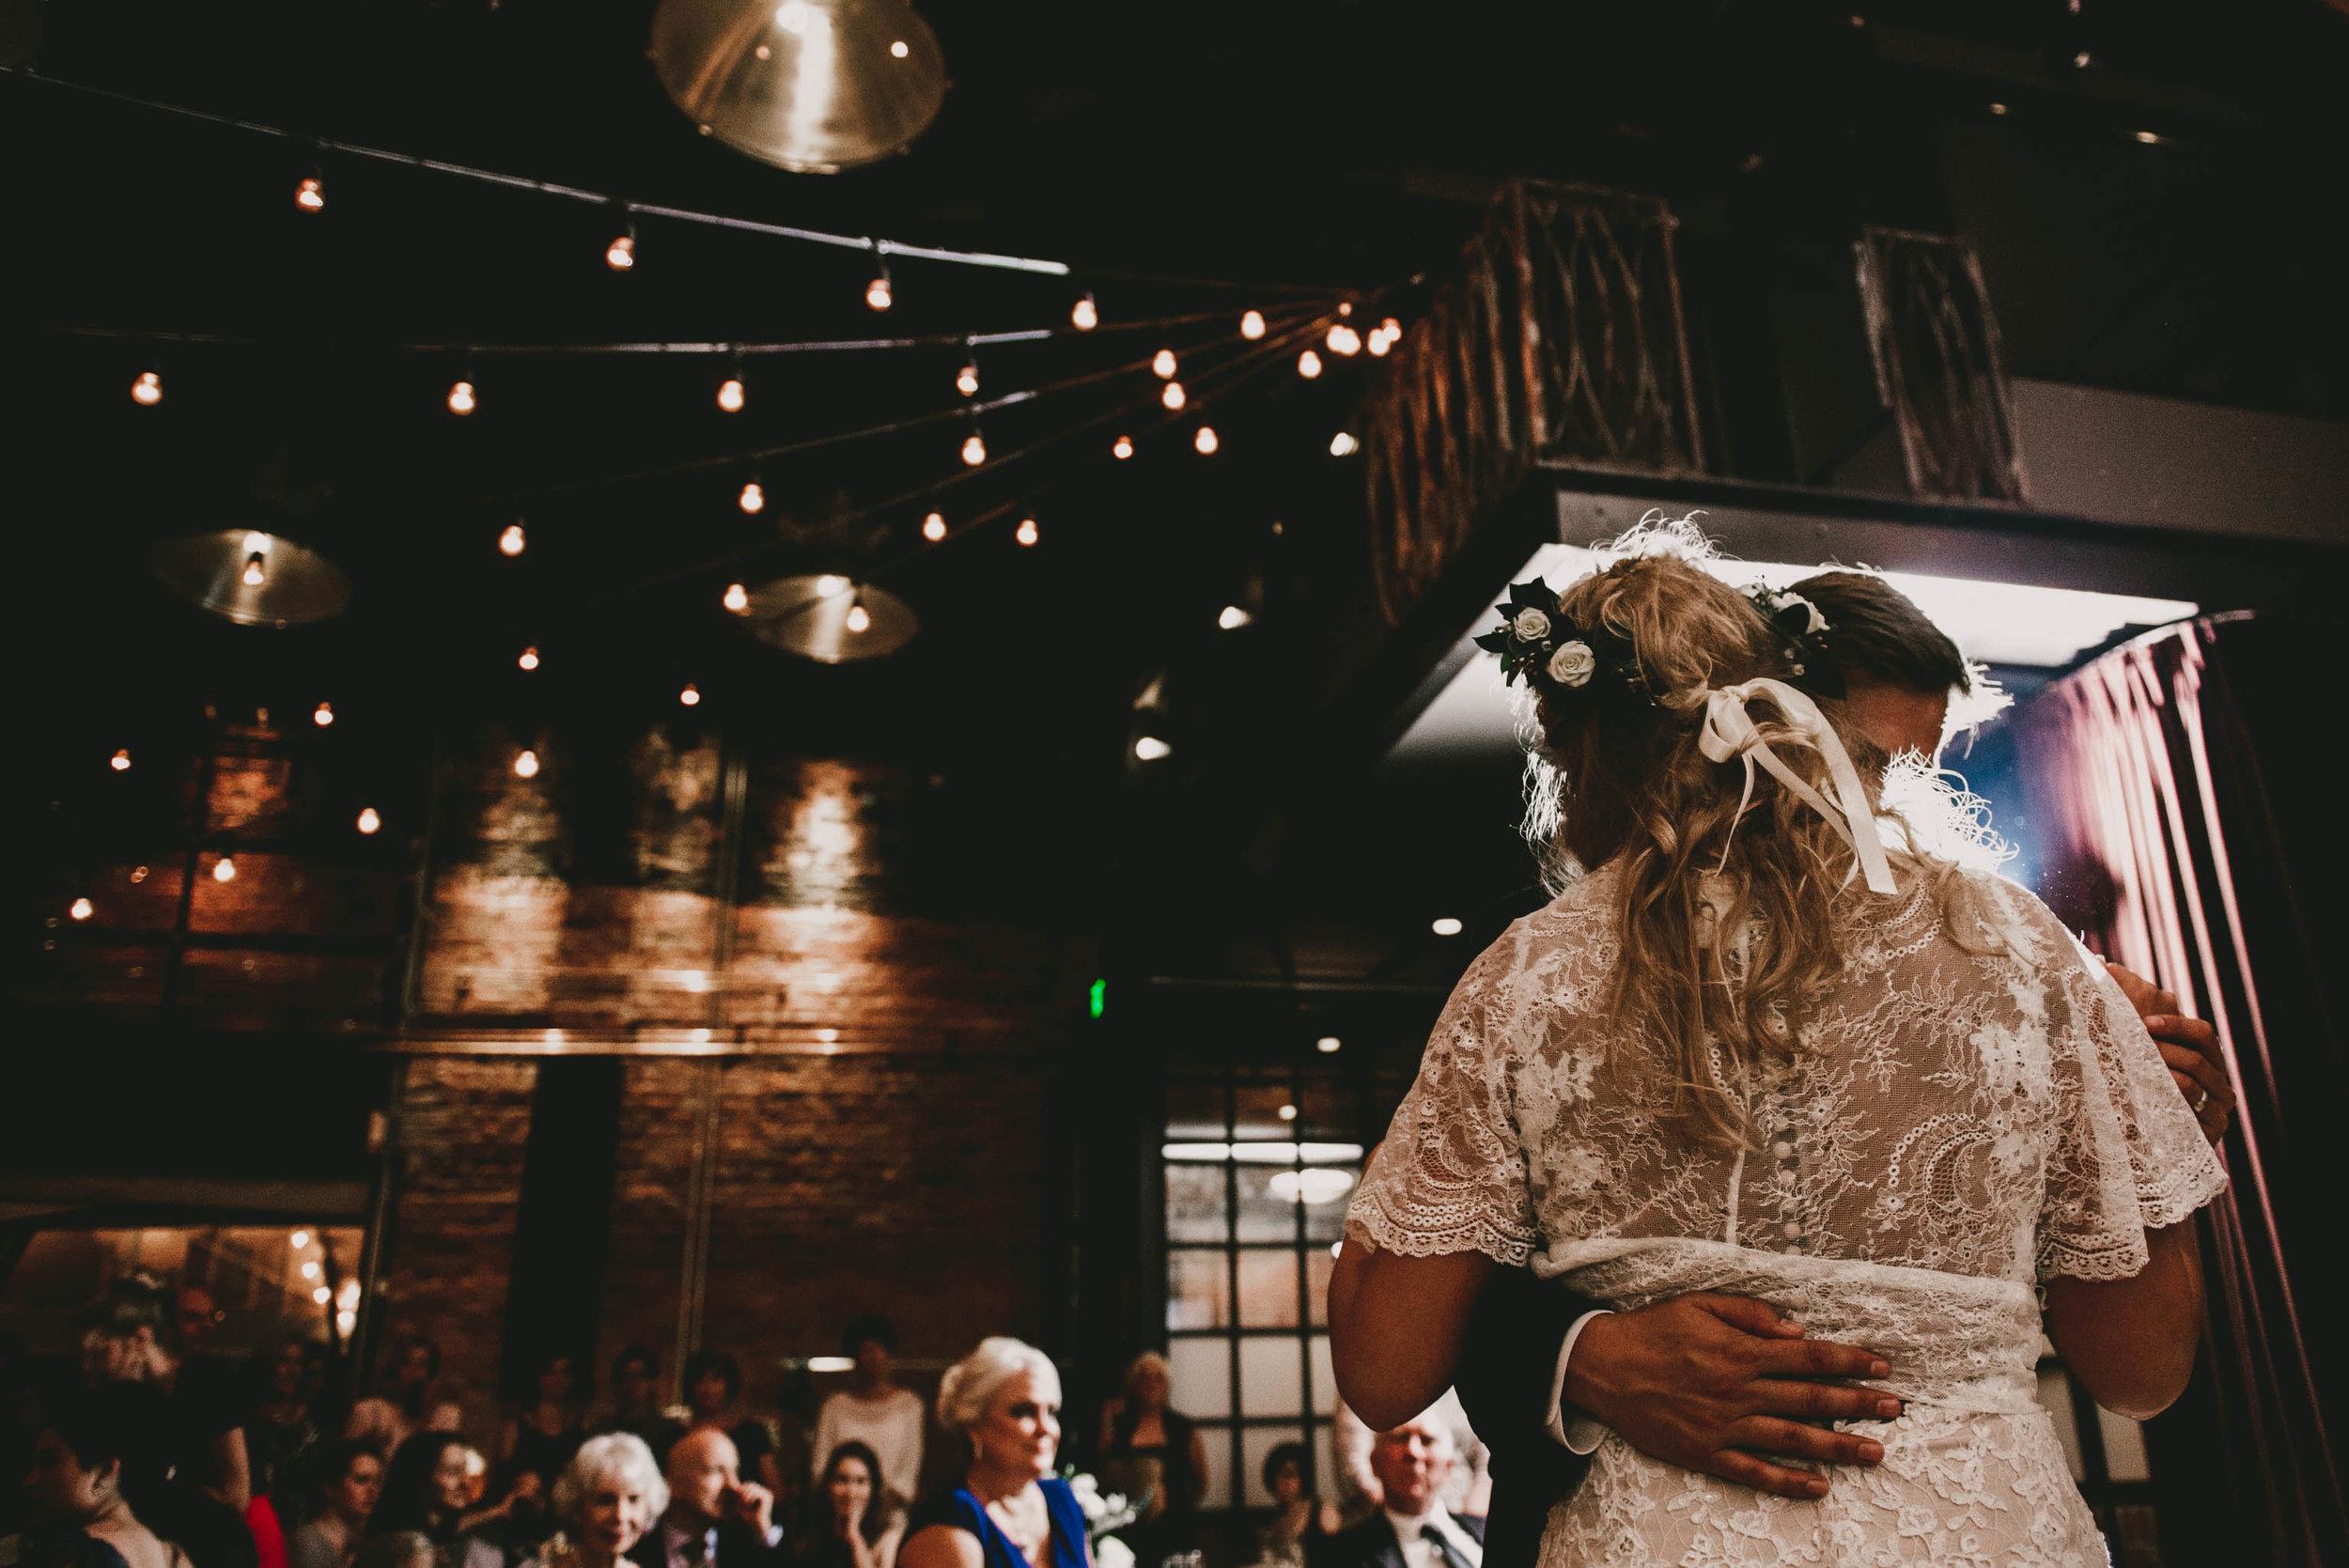 durham_wedding_photo_bride_and_groom.jpg